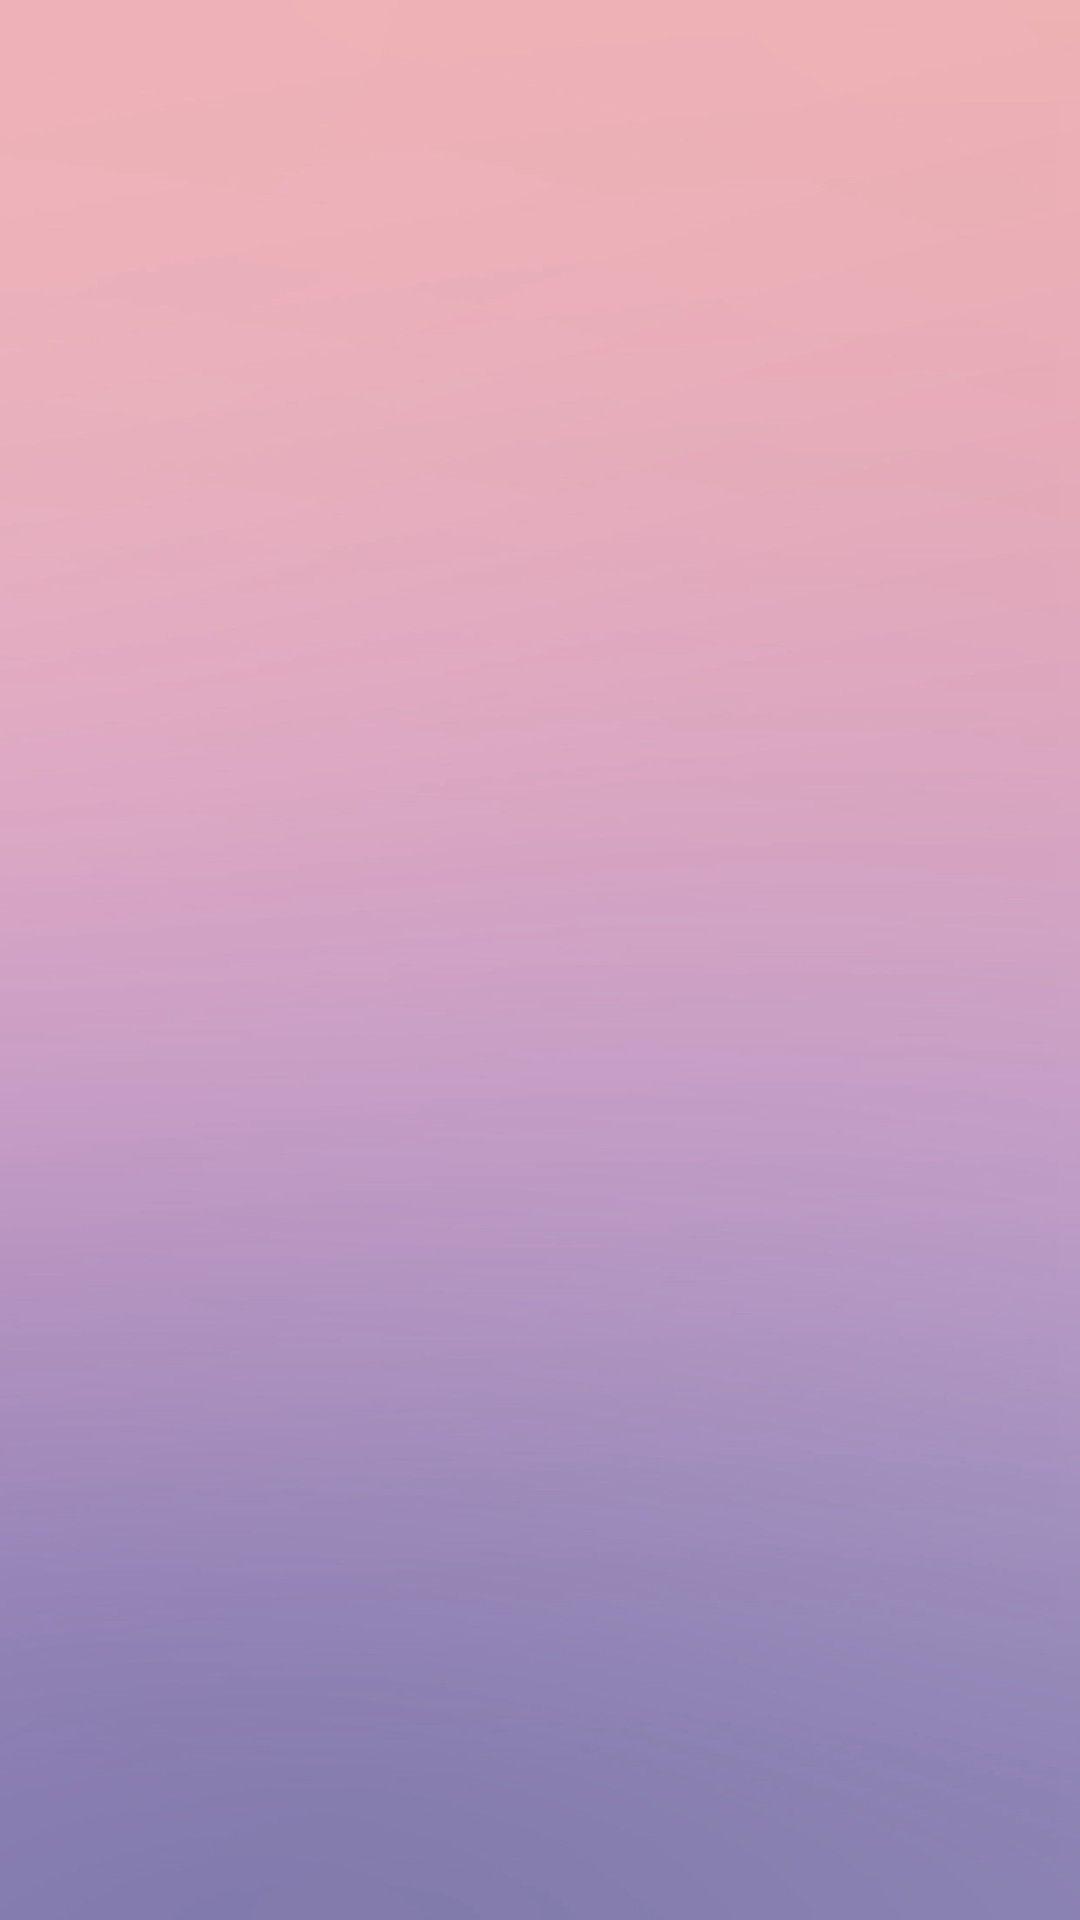 1080x1920 Pink Blue Purple Harmony Gradation Blur Iphone 8